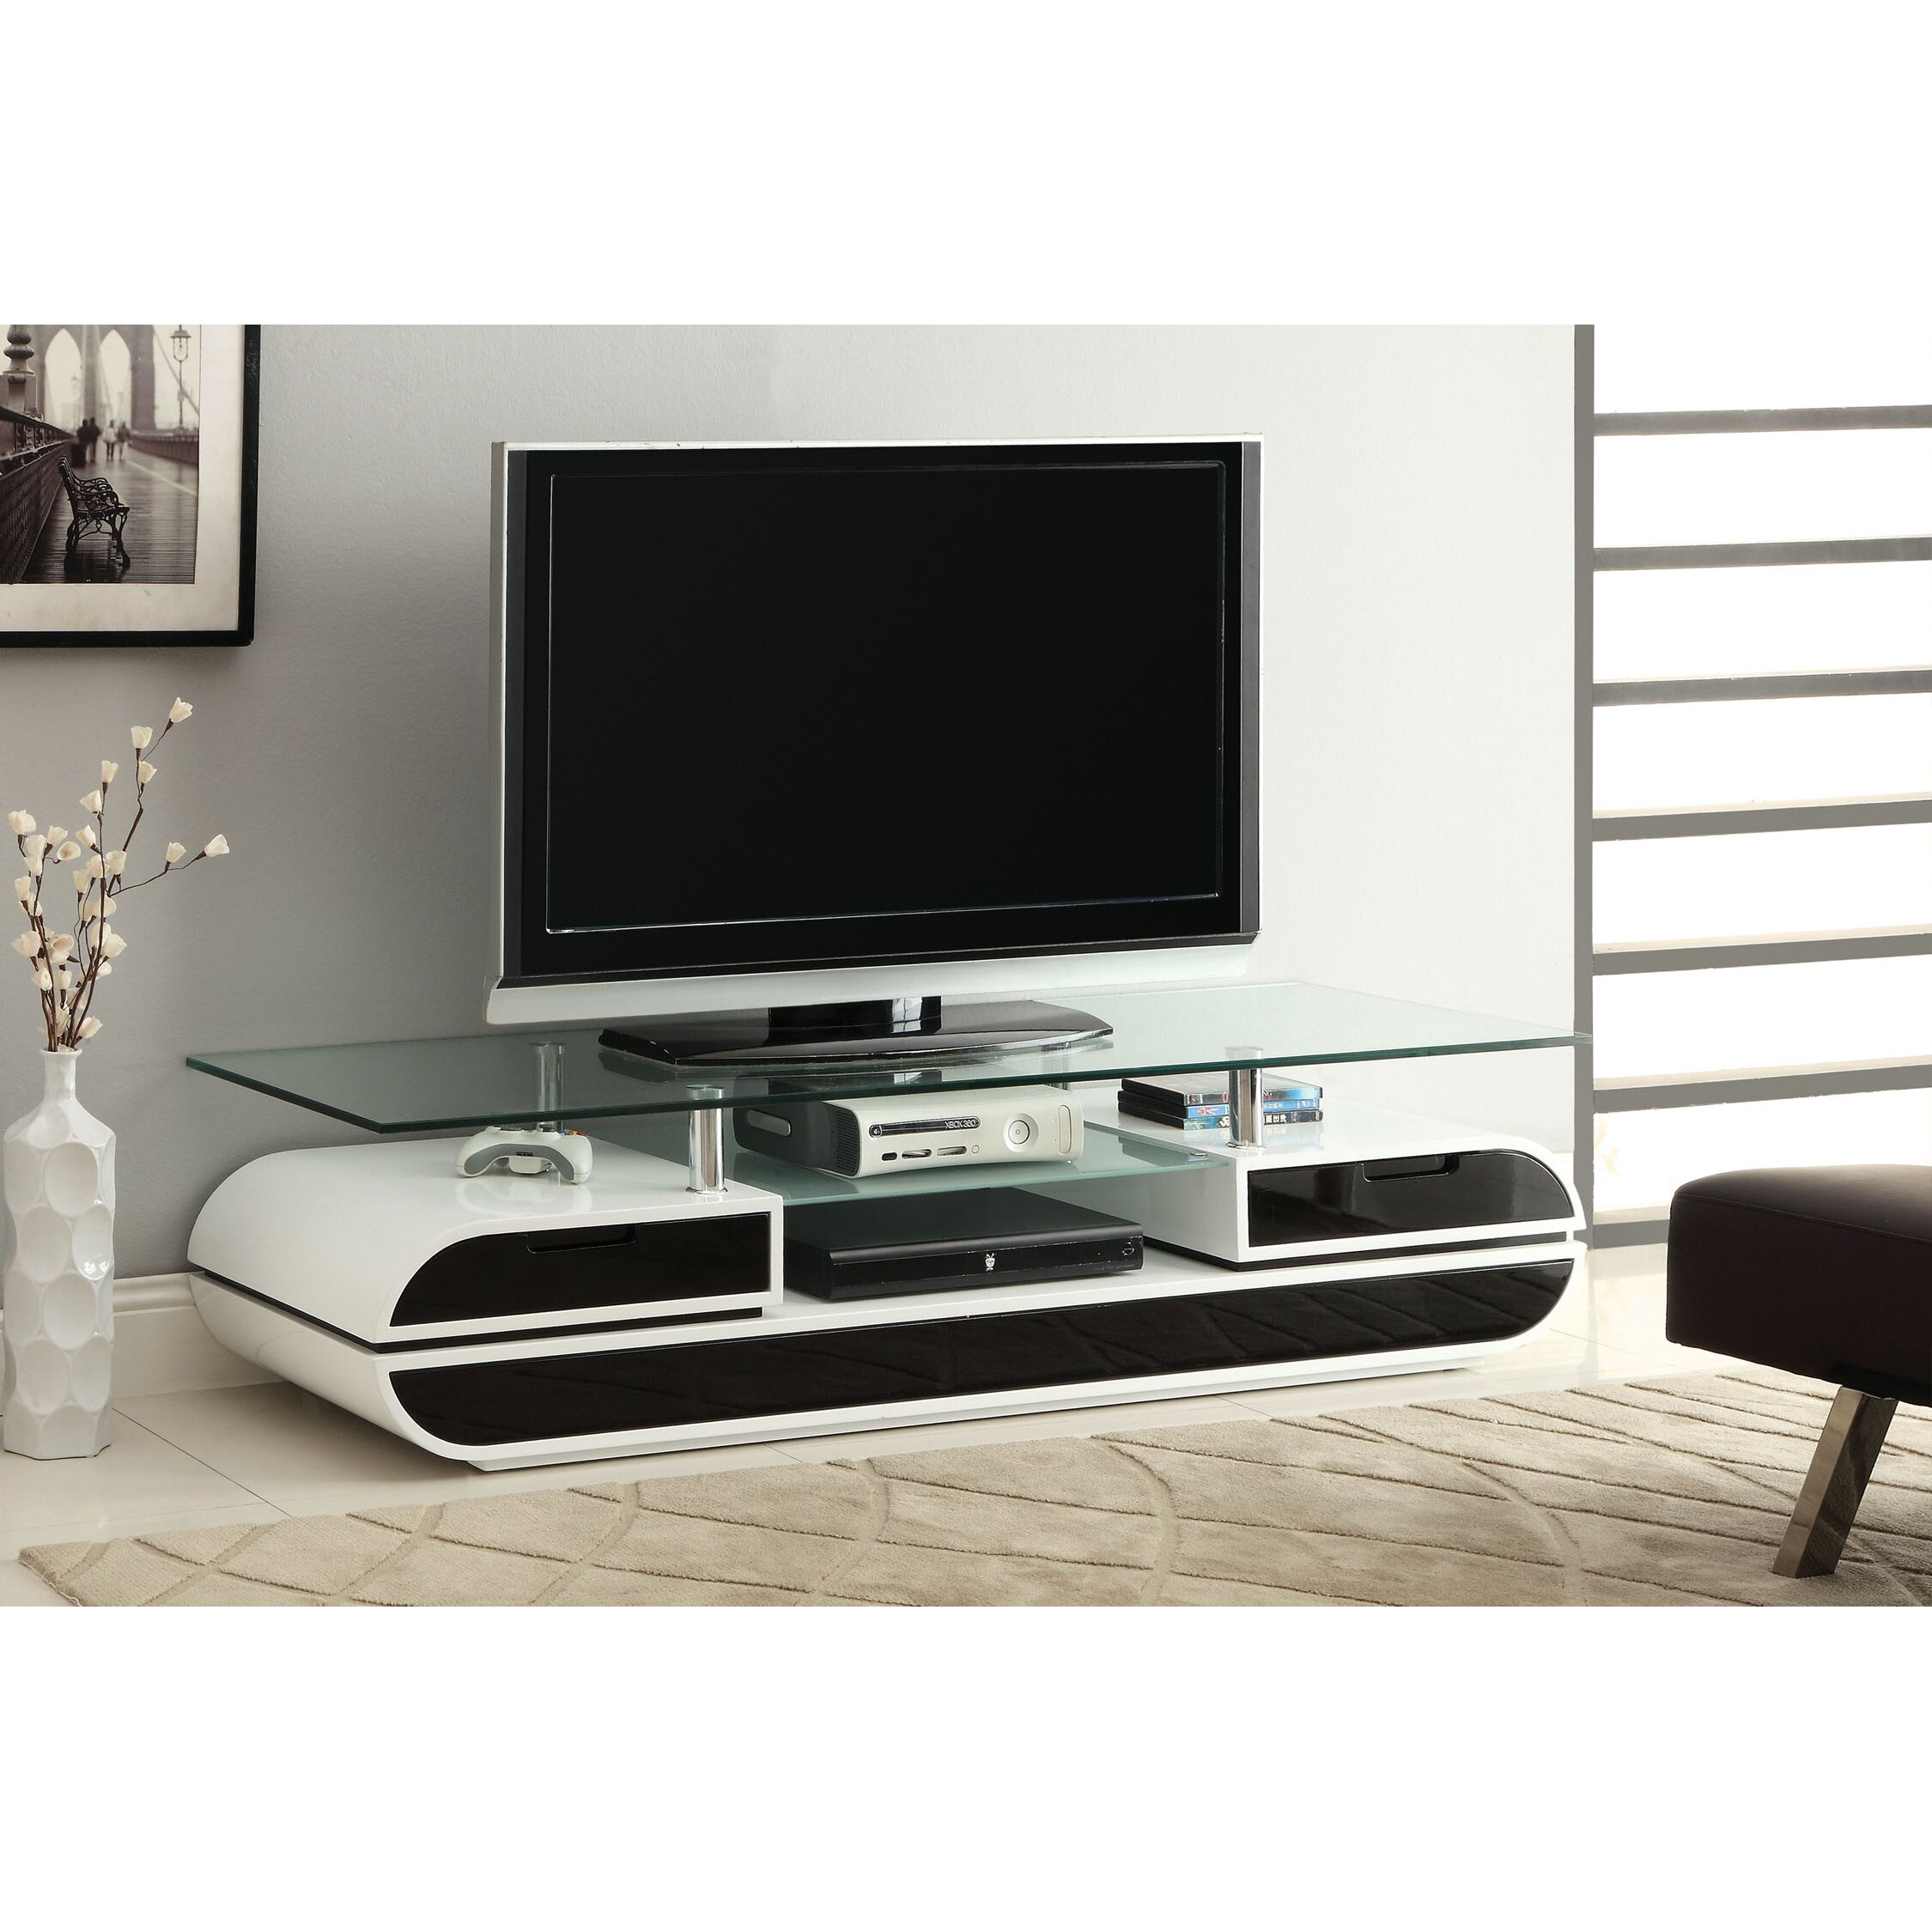 Hokku Designs Ethan Tv Stand Reviews